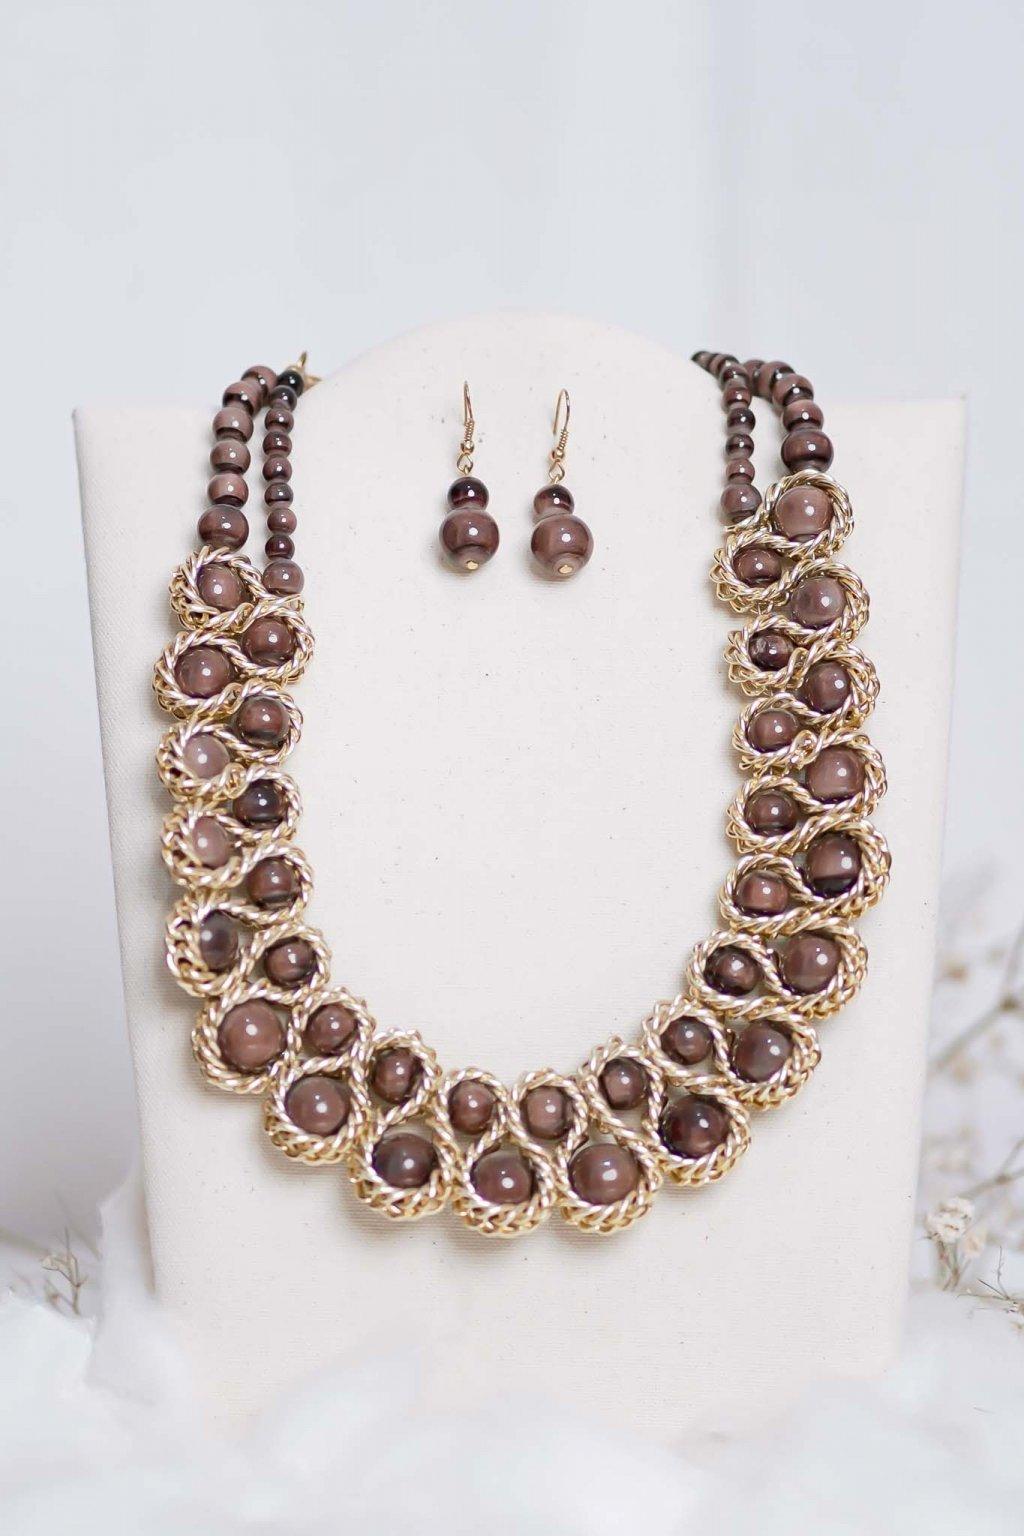 náhrdelník, šperk, spoločenská náhrdelník, náhrdelník na bežný deň, výrazný náhrdelník, jemný náhrdelník, šperky, náhrdelník na ples, svadbu, stužkovú 59